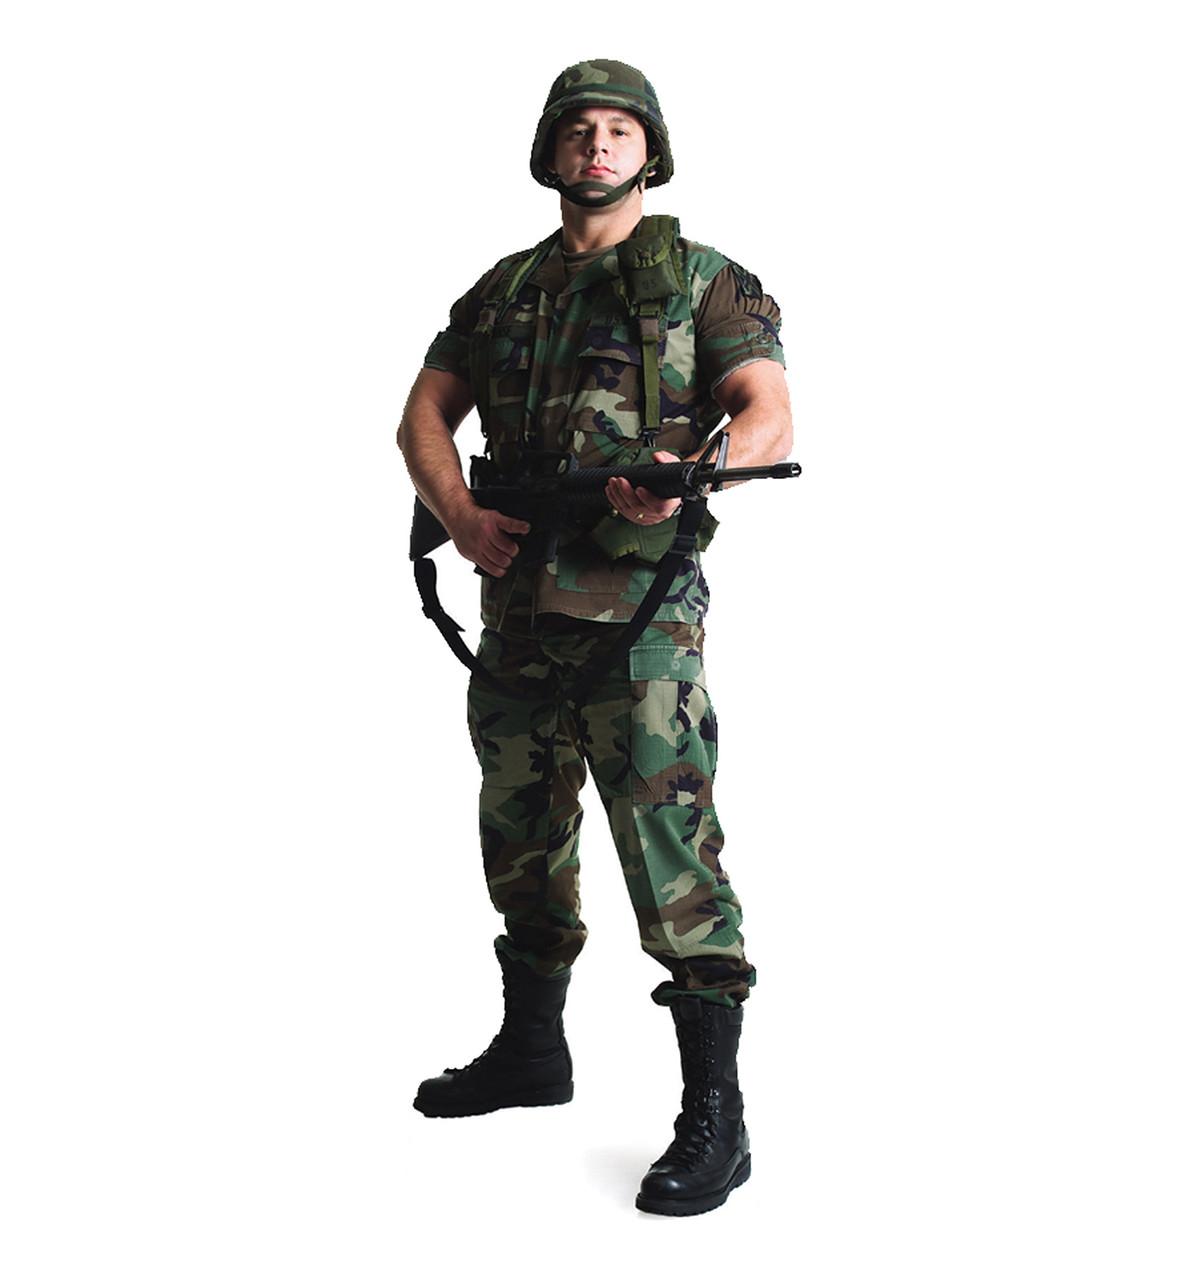 Life-size Army Soldier Cardboard Standup   Cardboard Cutout